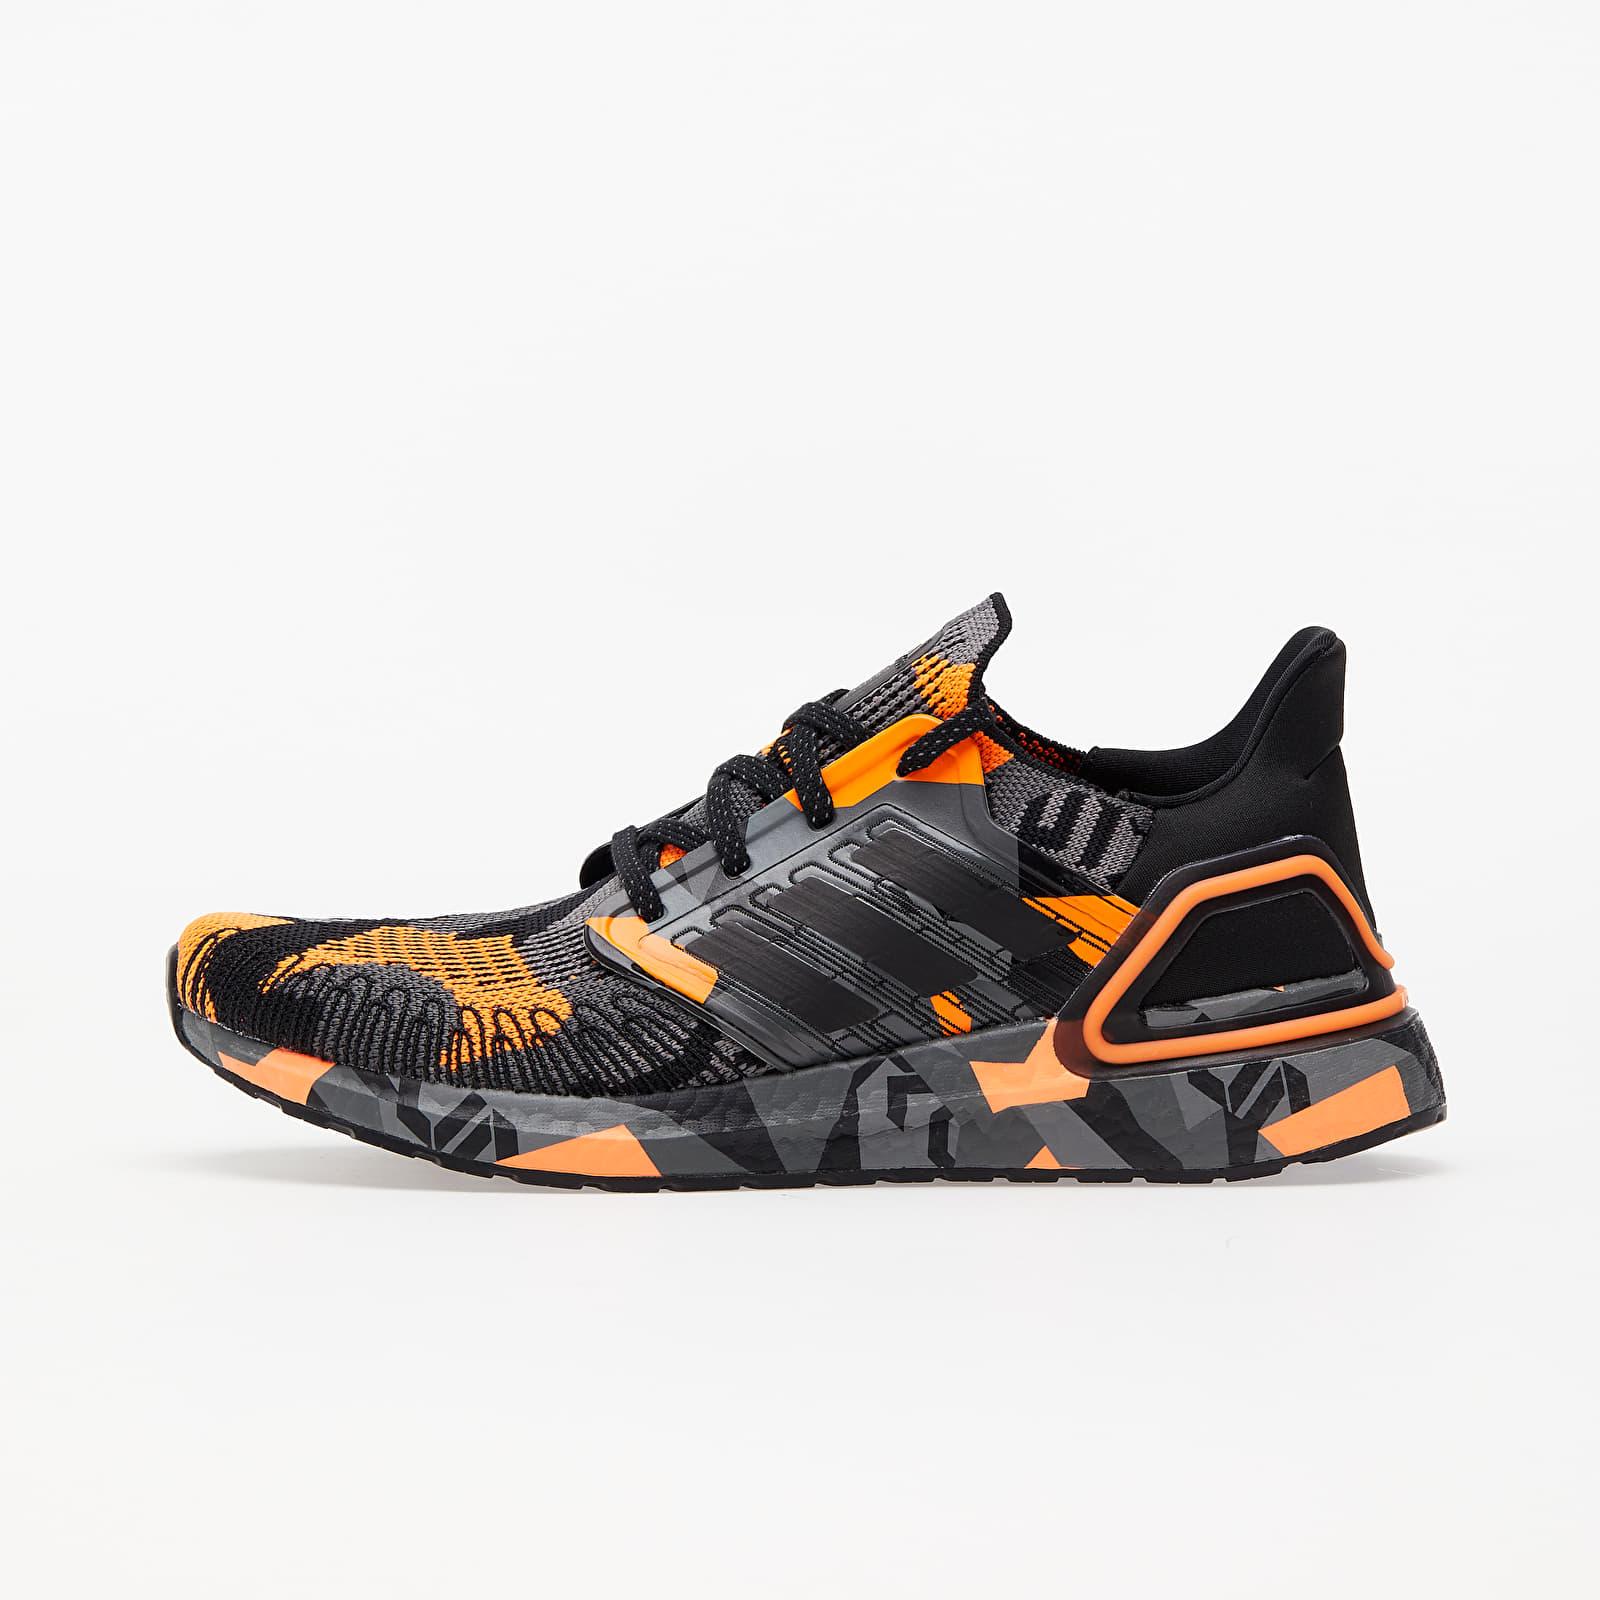 Men's shoes adidas UltraBOOST 20 Core Black/ Core Black/ Signature Orange